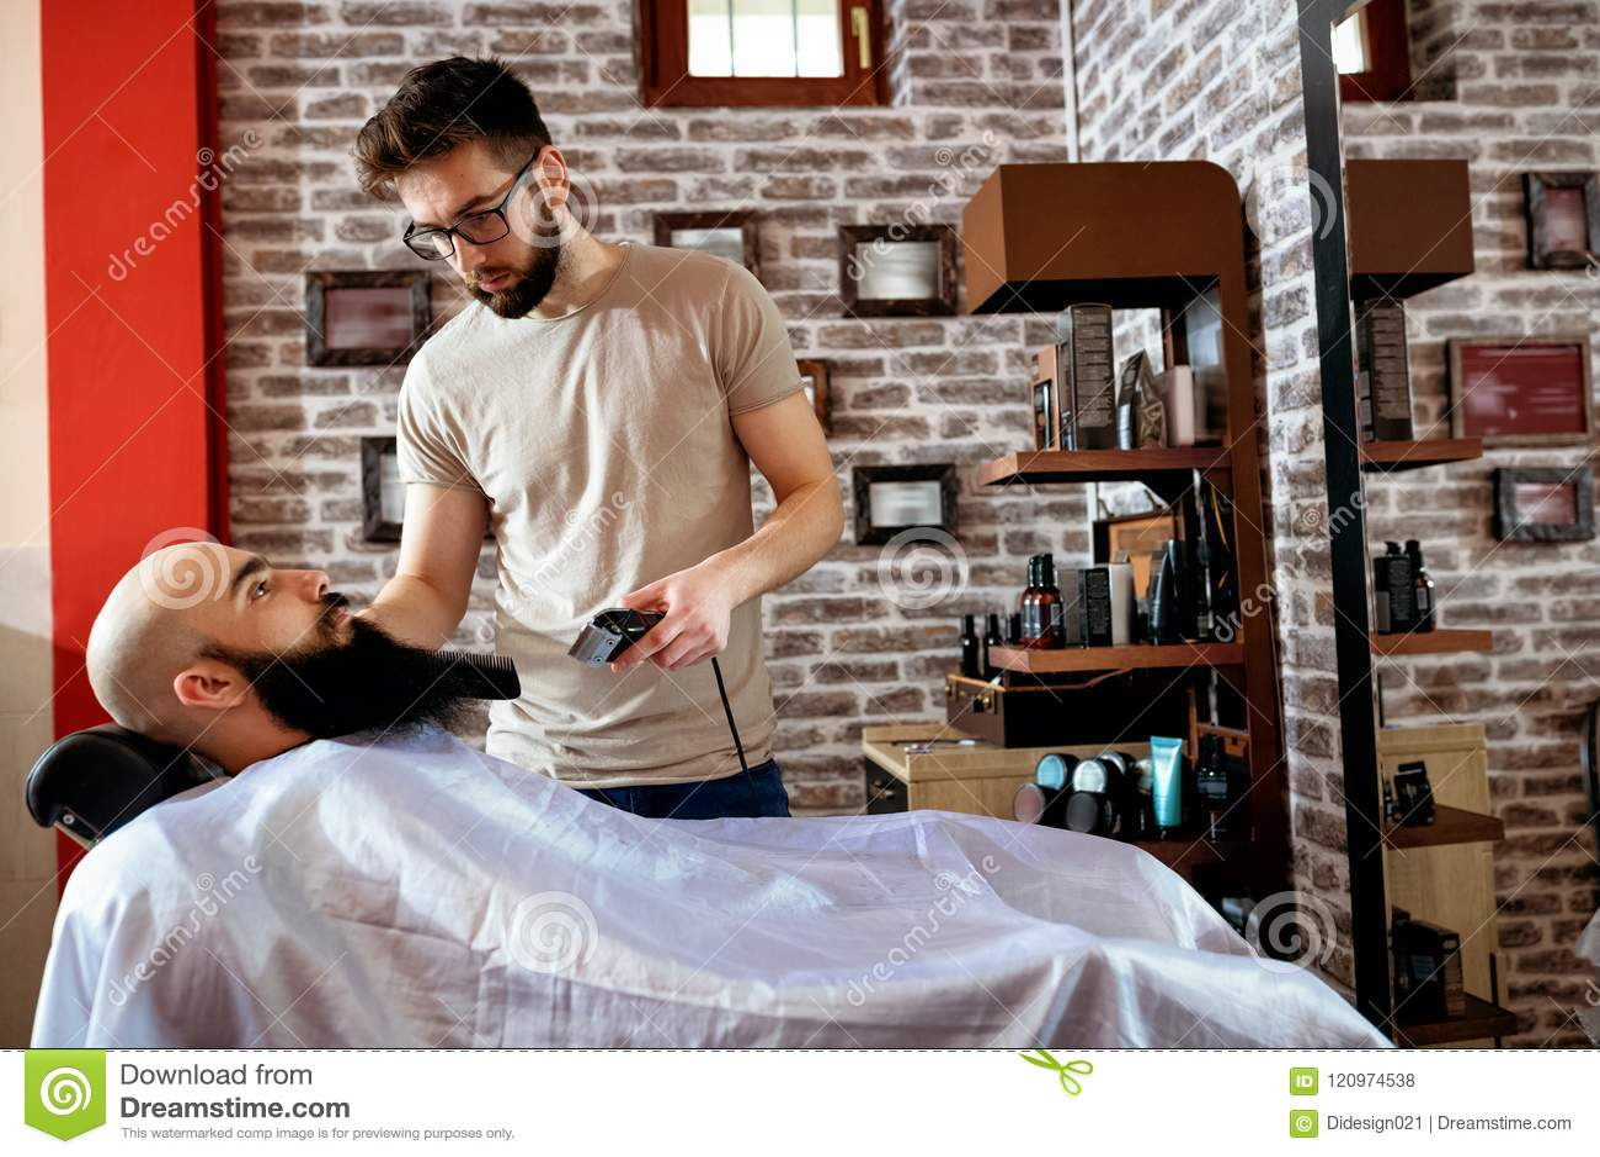 Master makes beards correction, man beauty concept